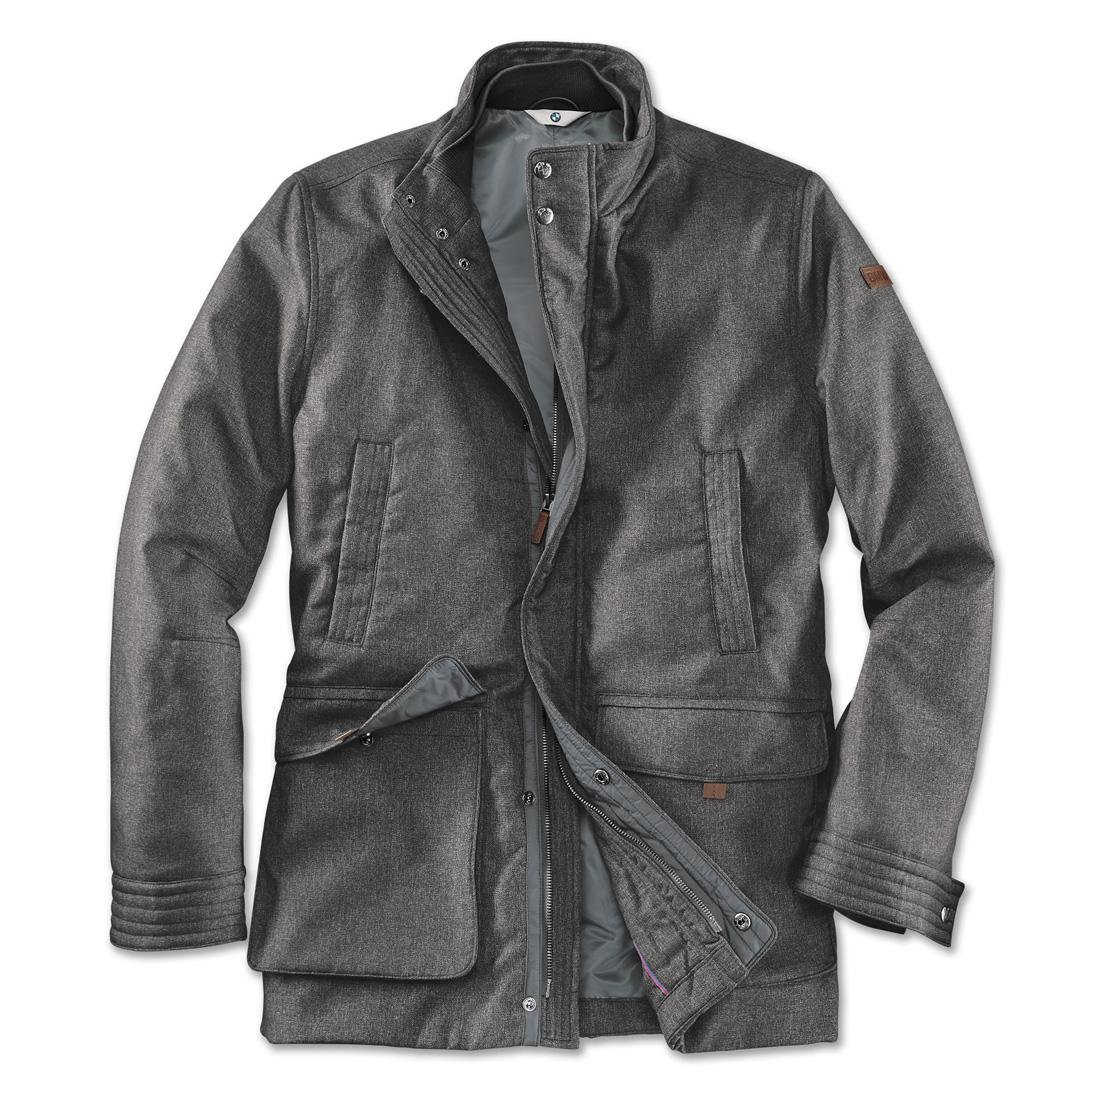 BMW Men's Jacket Grey Small